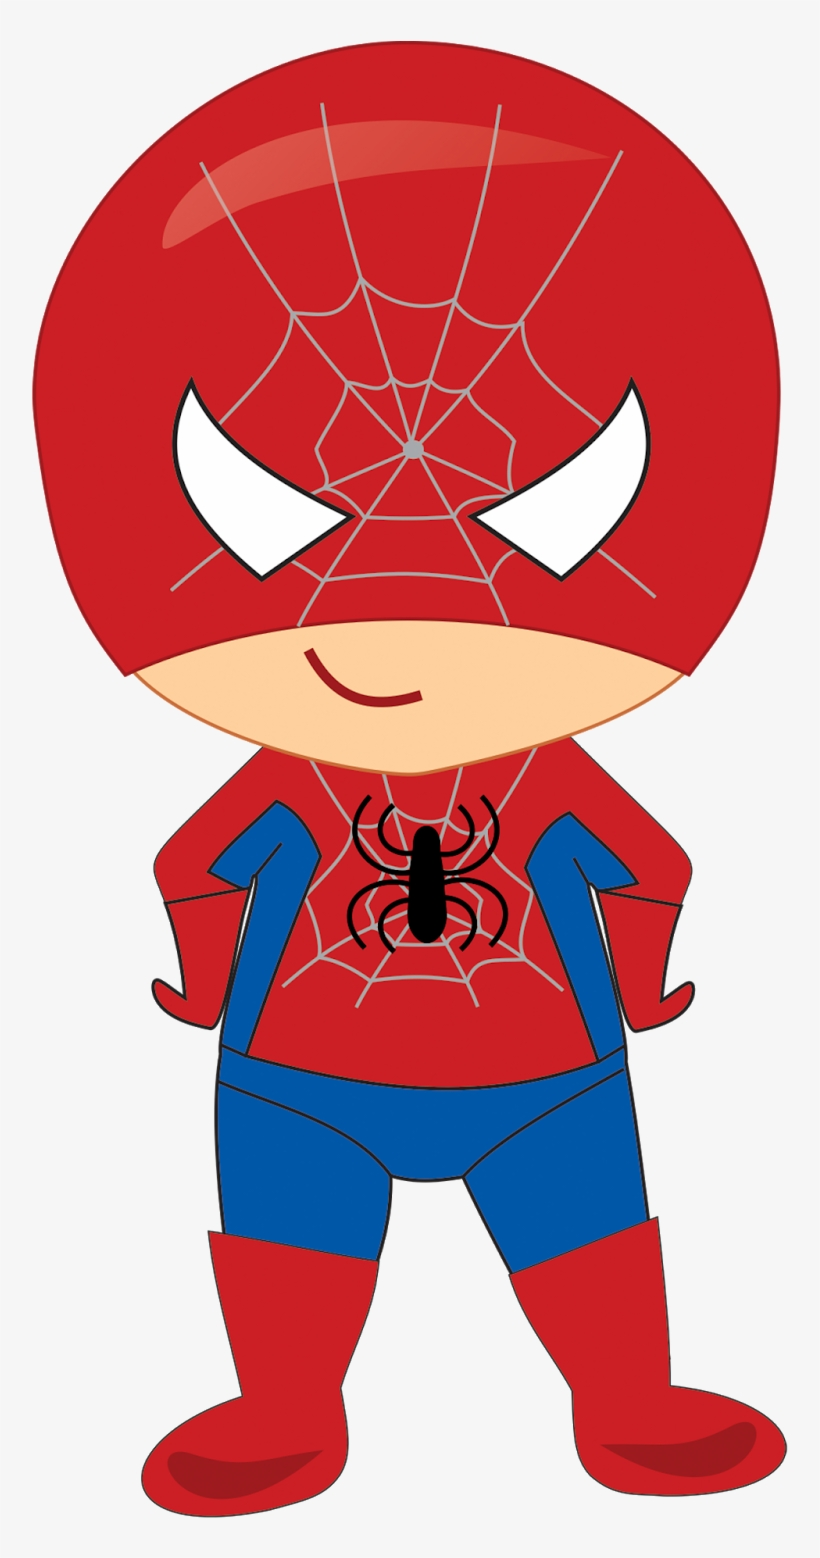 Baby superhero clipart free jpg royalty free stock Banner Black And White Stock Baby Superhero Clipart - Super Heroes ... jpg royalty free stock